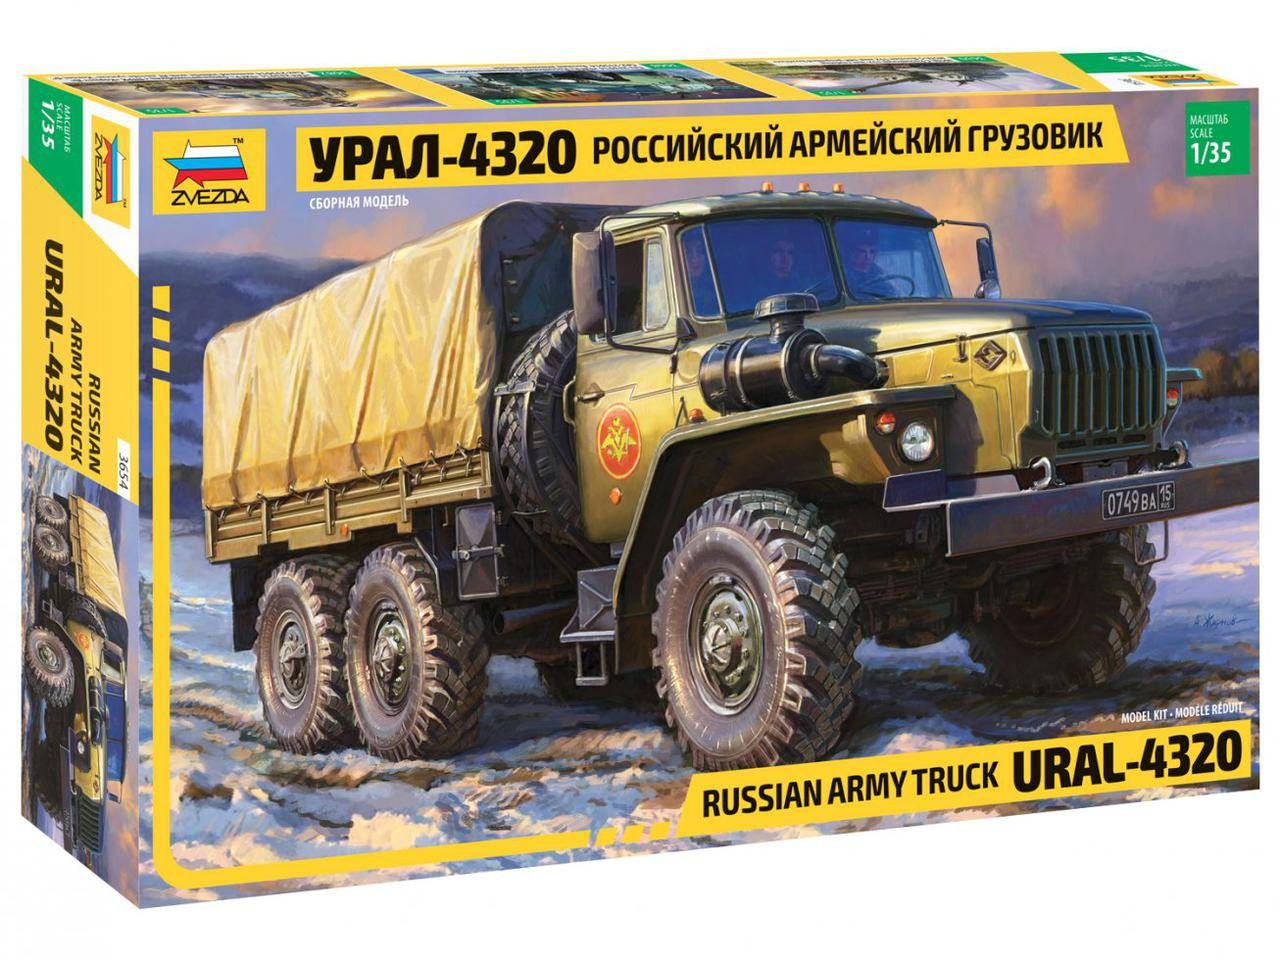 Урал-4320 Советский армейский грузовик. 1/35 ZVEZDA 3654